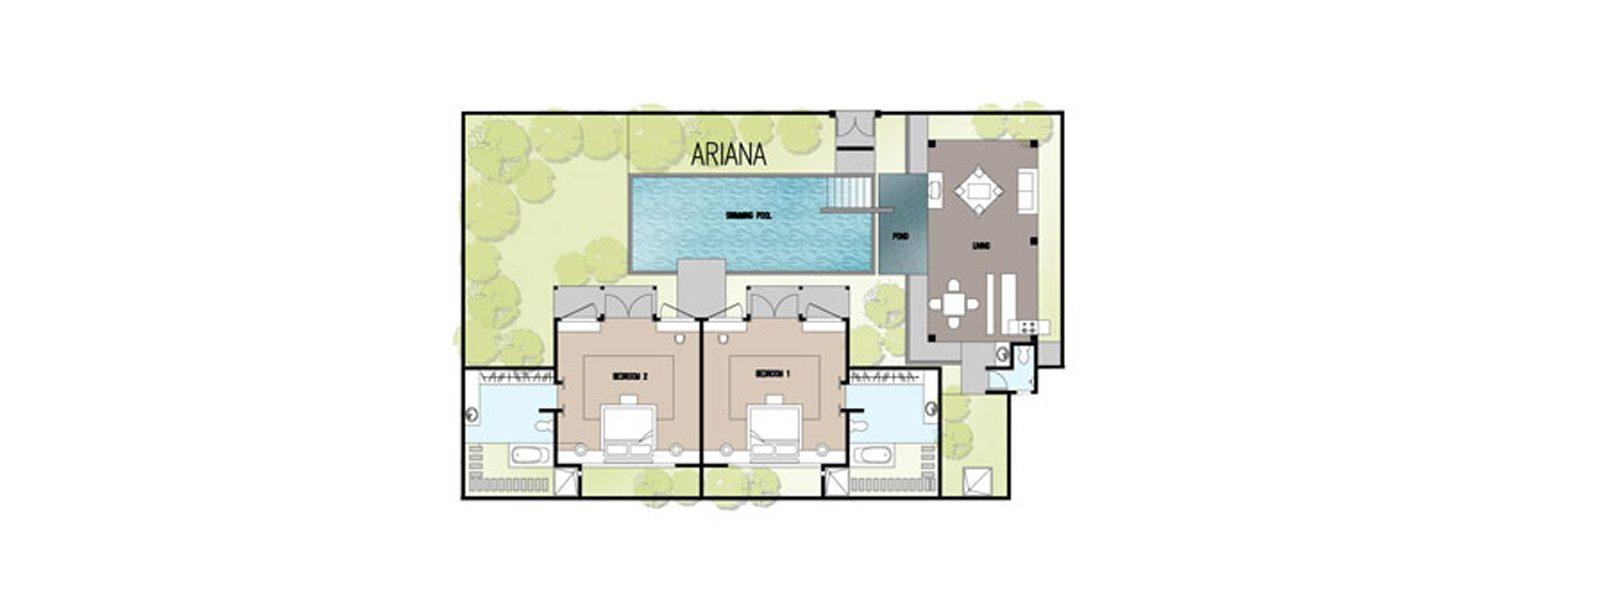 Villa Ariana Floorplan | Umalas, Bali